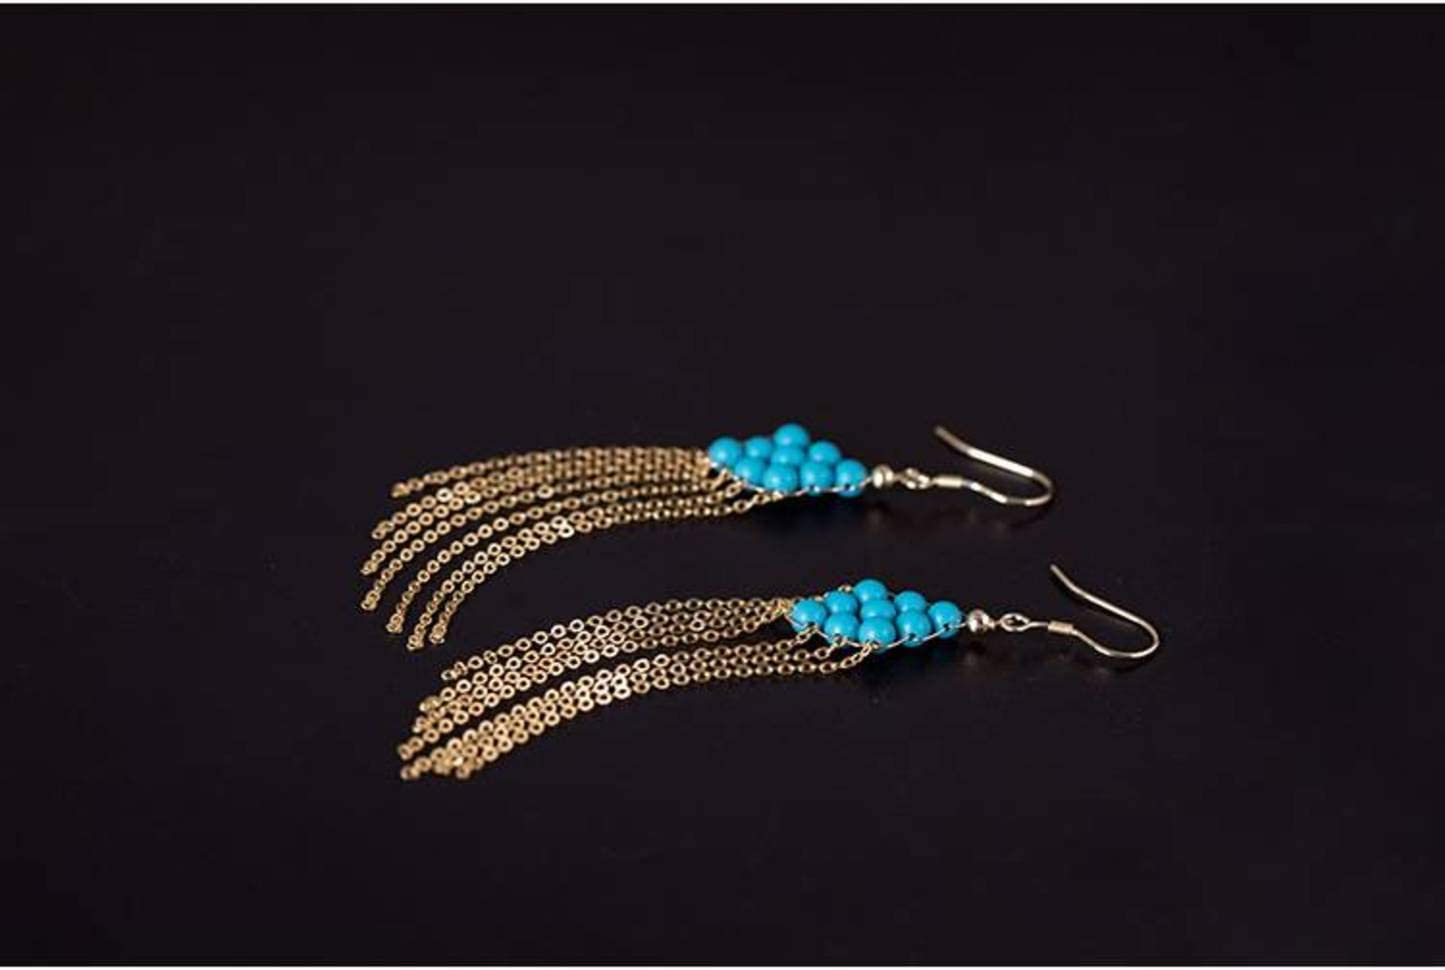 925 Silver QiongXi Eardrop Earring Stud Earrings for Women Design Handmade Diys925 Silver Classical Ethnic Style Earrings Temperament Blue Turquoise Tassel Medium Long Ear Hook EarringsAs Shown